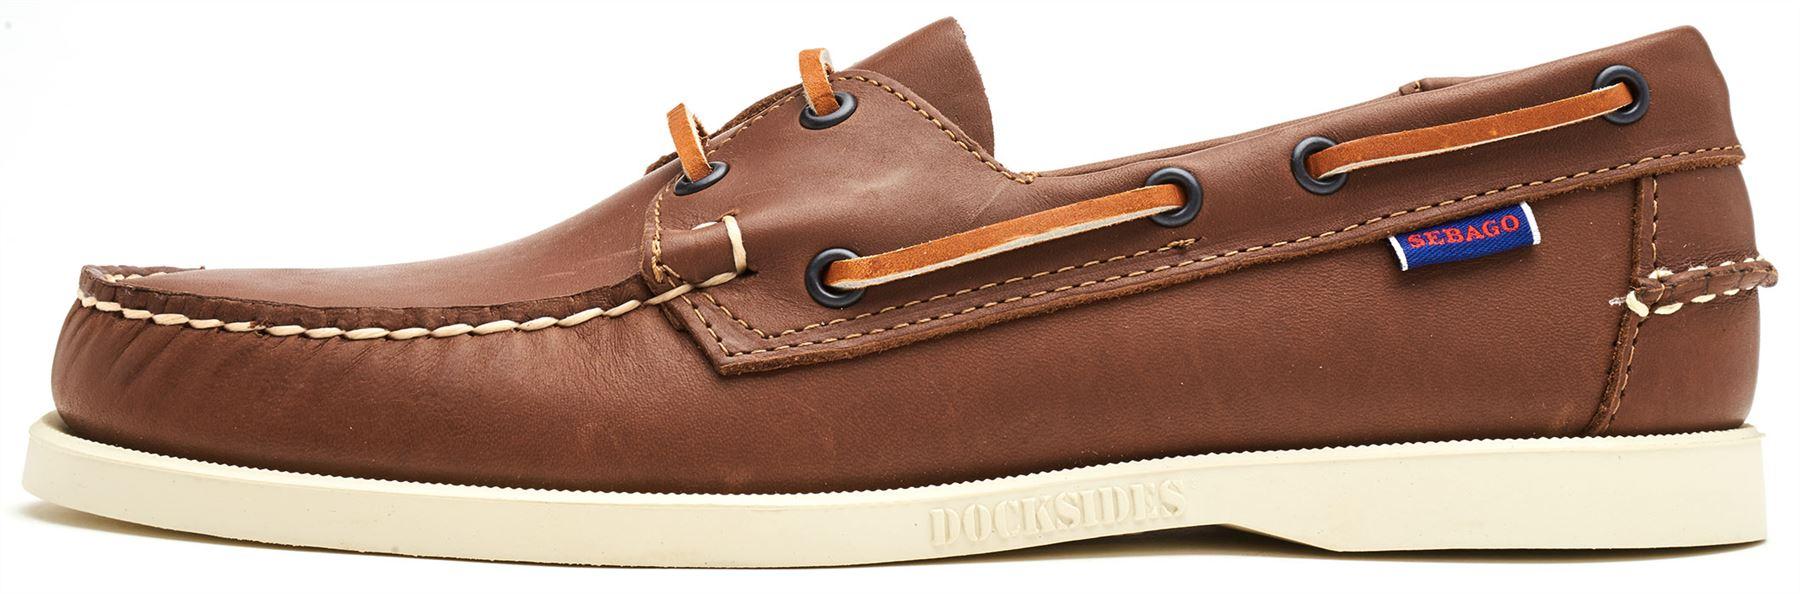 Sebago-Docksides-NBK-Suede-Boat-Deck-Shoes-in-Navy-Blue-amp-Coral-amp-Dark-Brown thumbnail 18